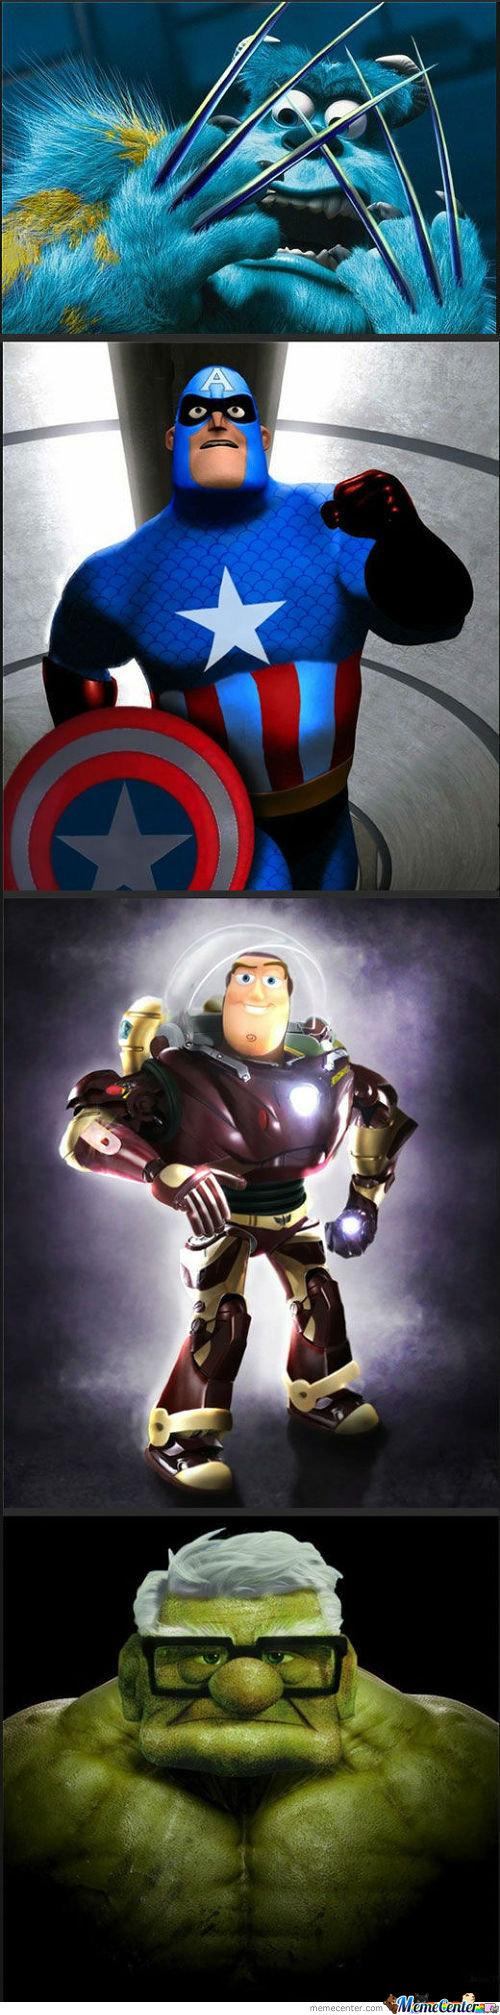 Disney heros. yupp not mine.. ill just leave this here disnes heros